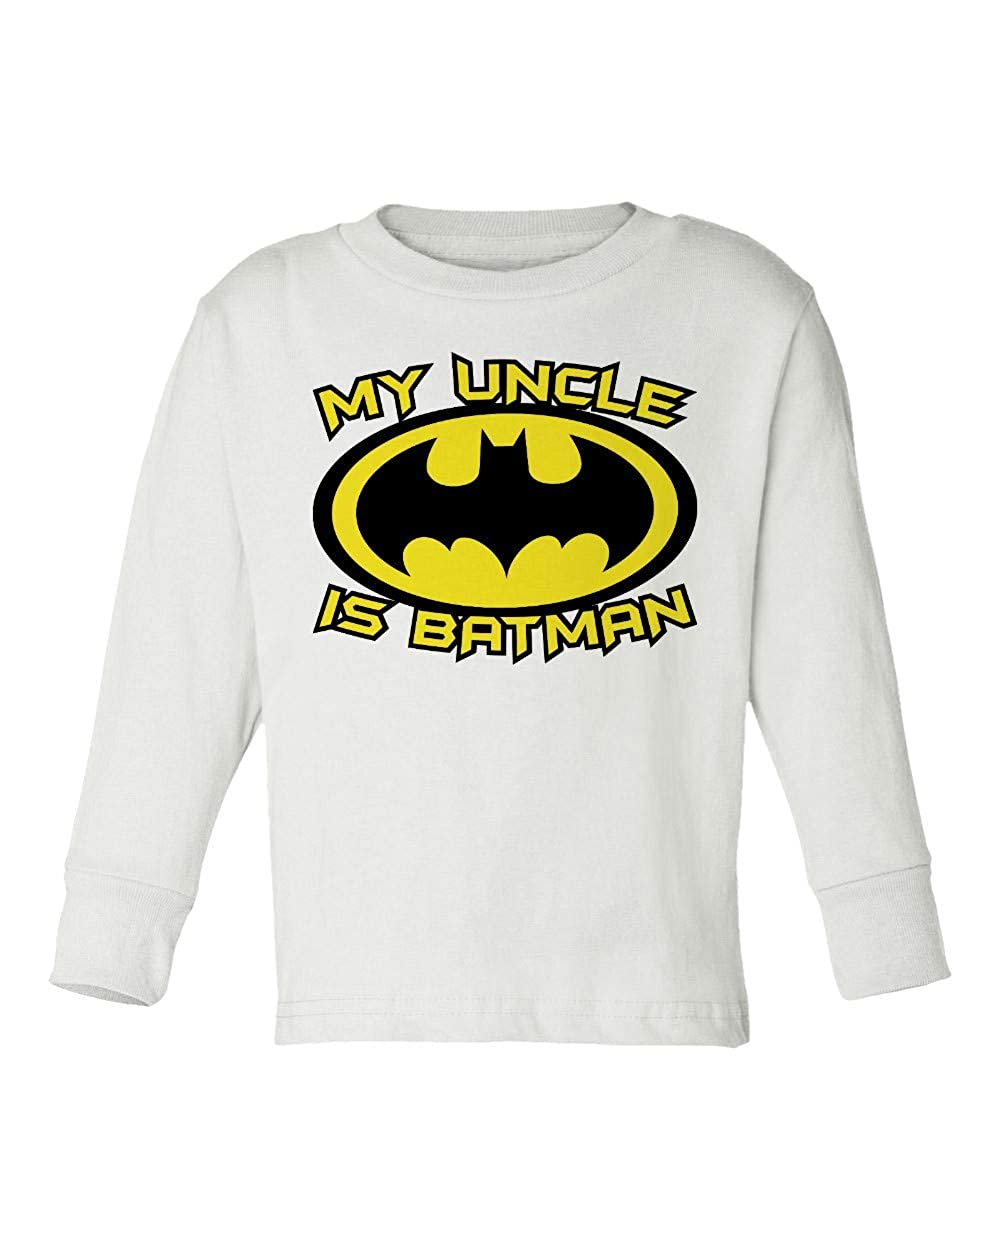 Societee My Uncle is A Bat Cute Funny Superhero Girls Boys Toddler Long Sleeve T-Shirt